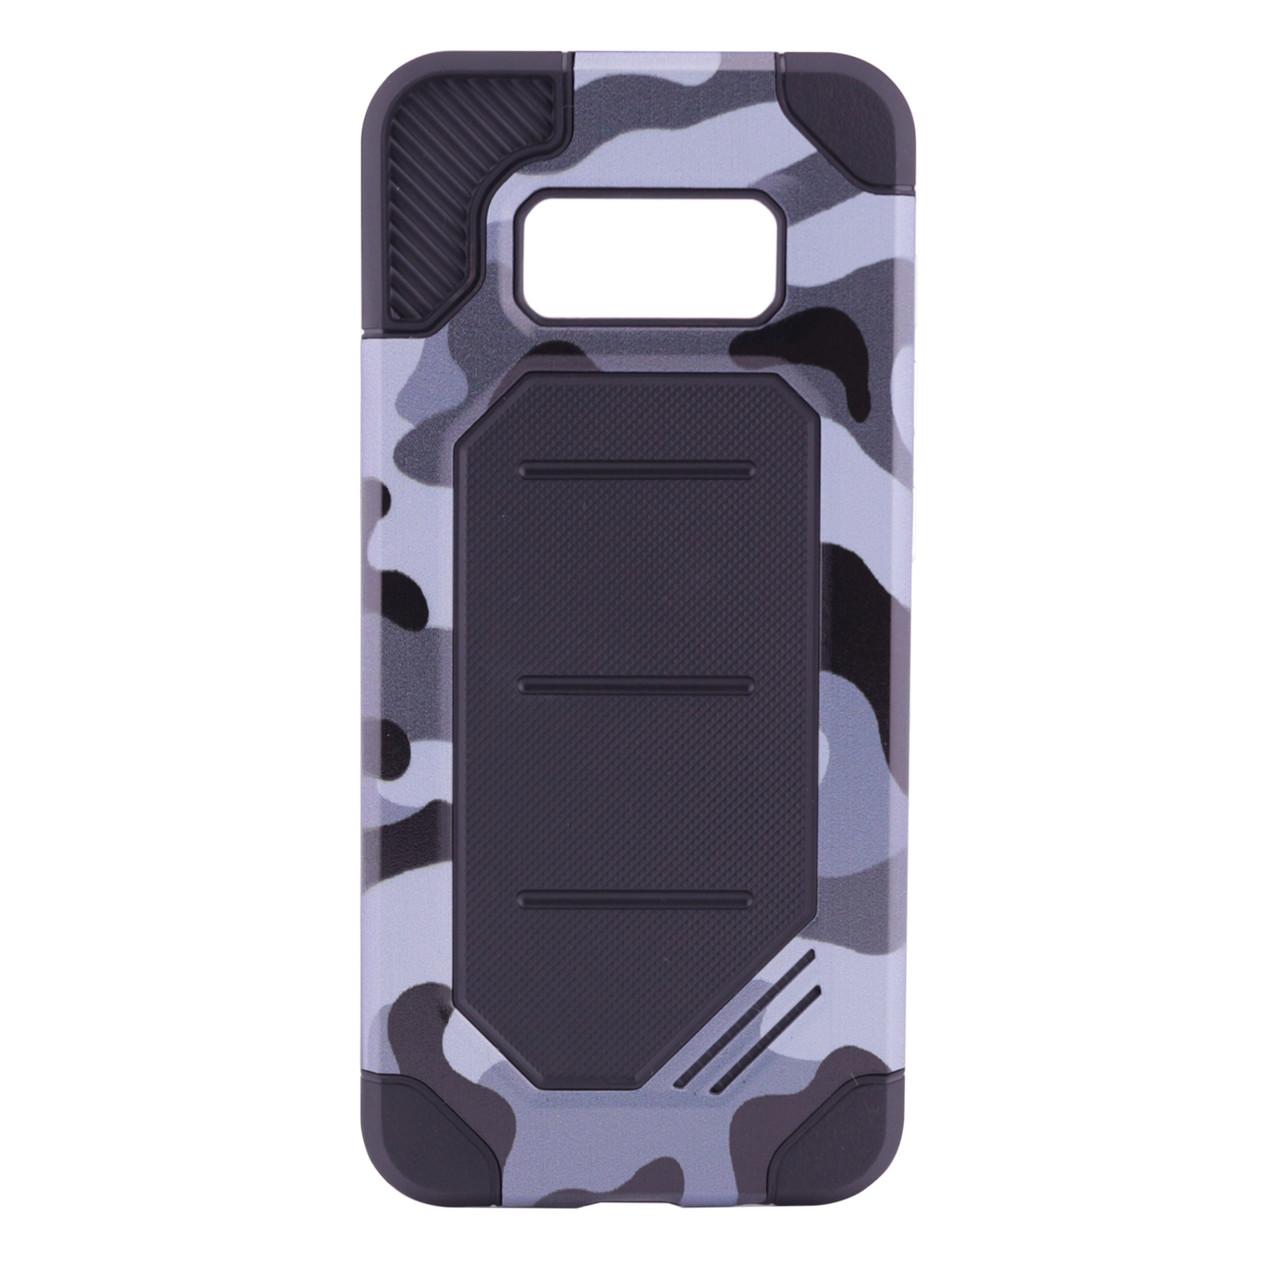 Чохол-накладка Motomo для Samsung G950 S8 Military ser. Камуфляж Сірий